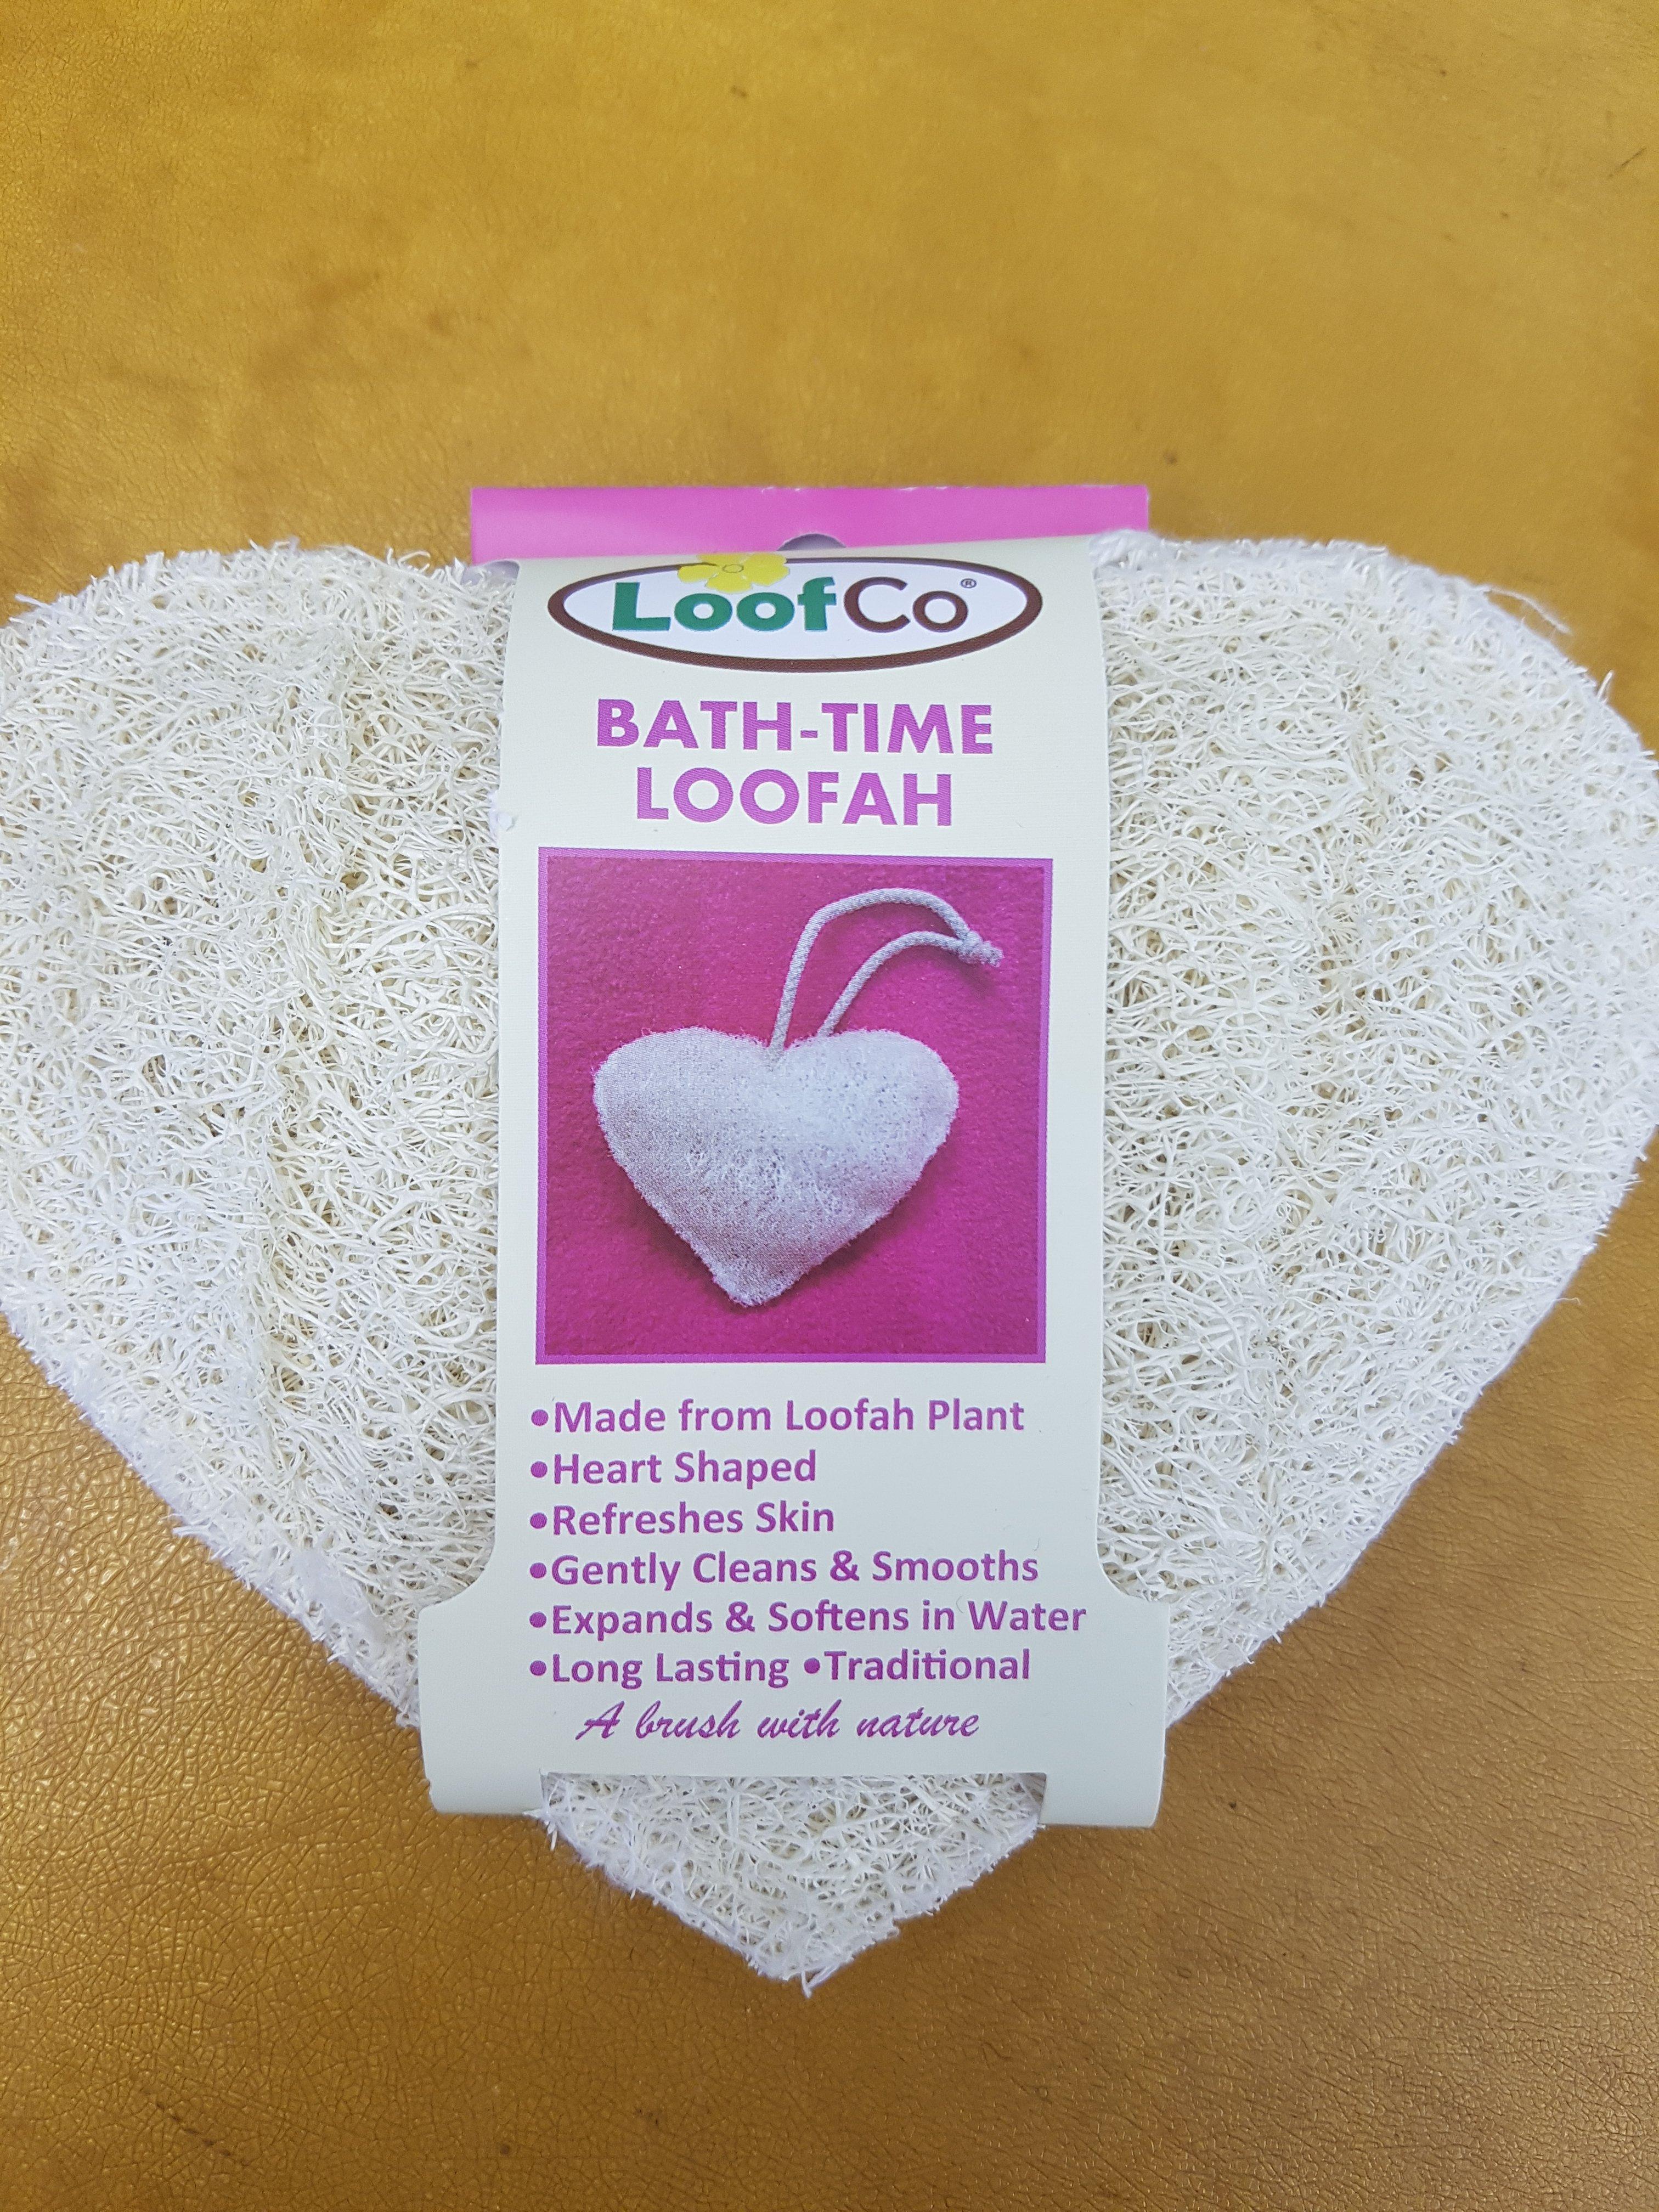 Heart bath time loofah